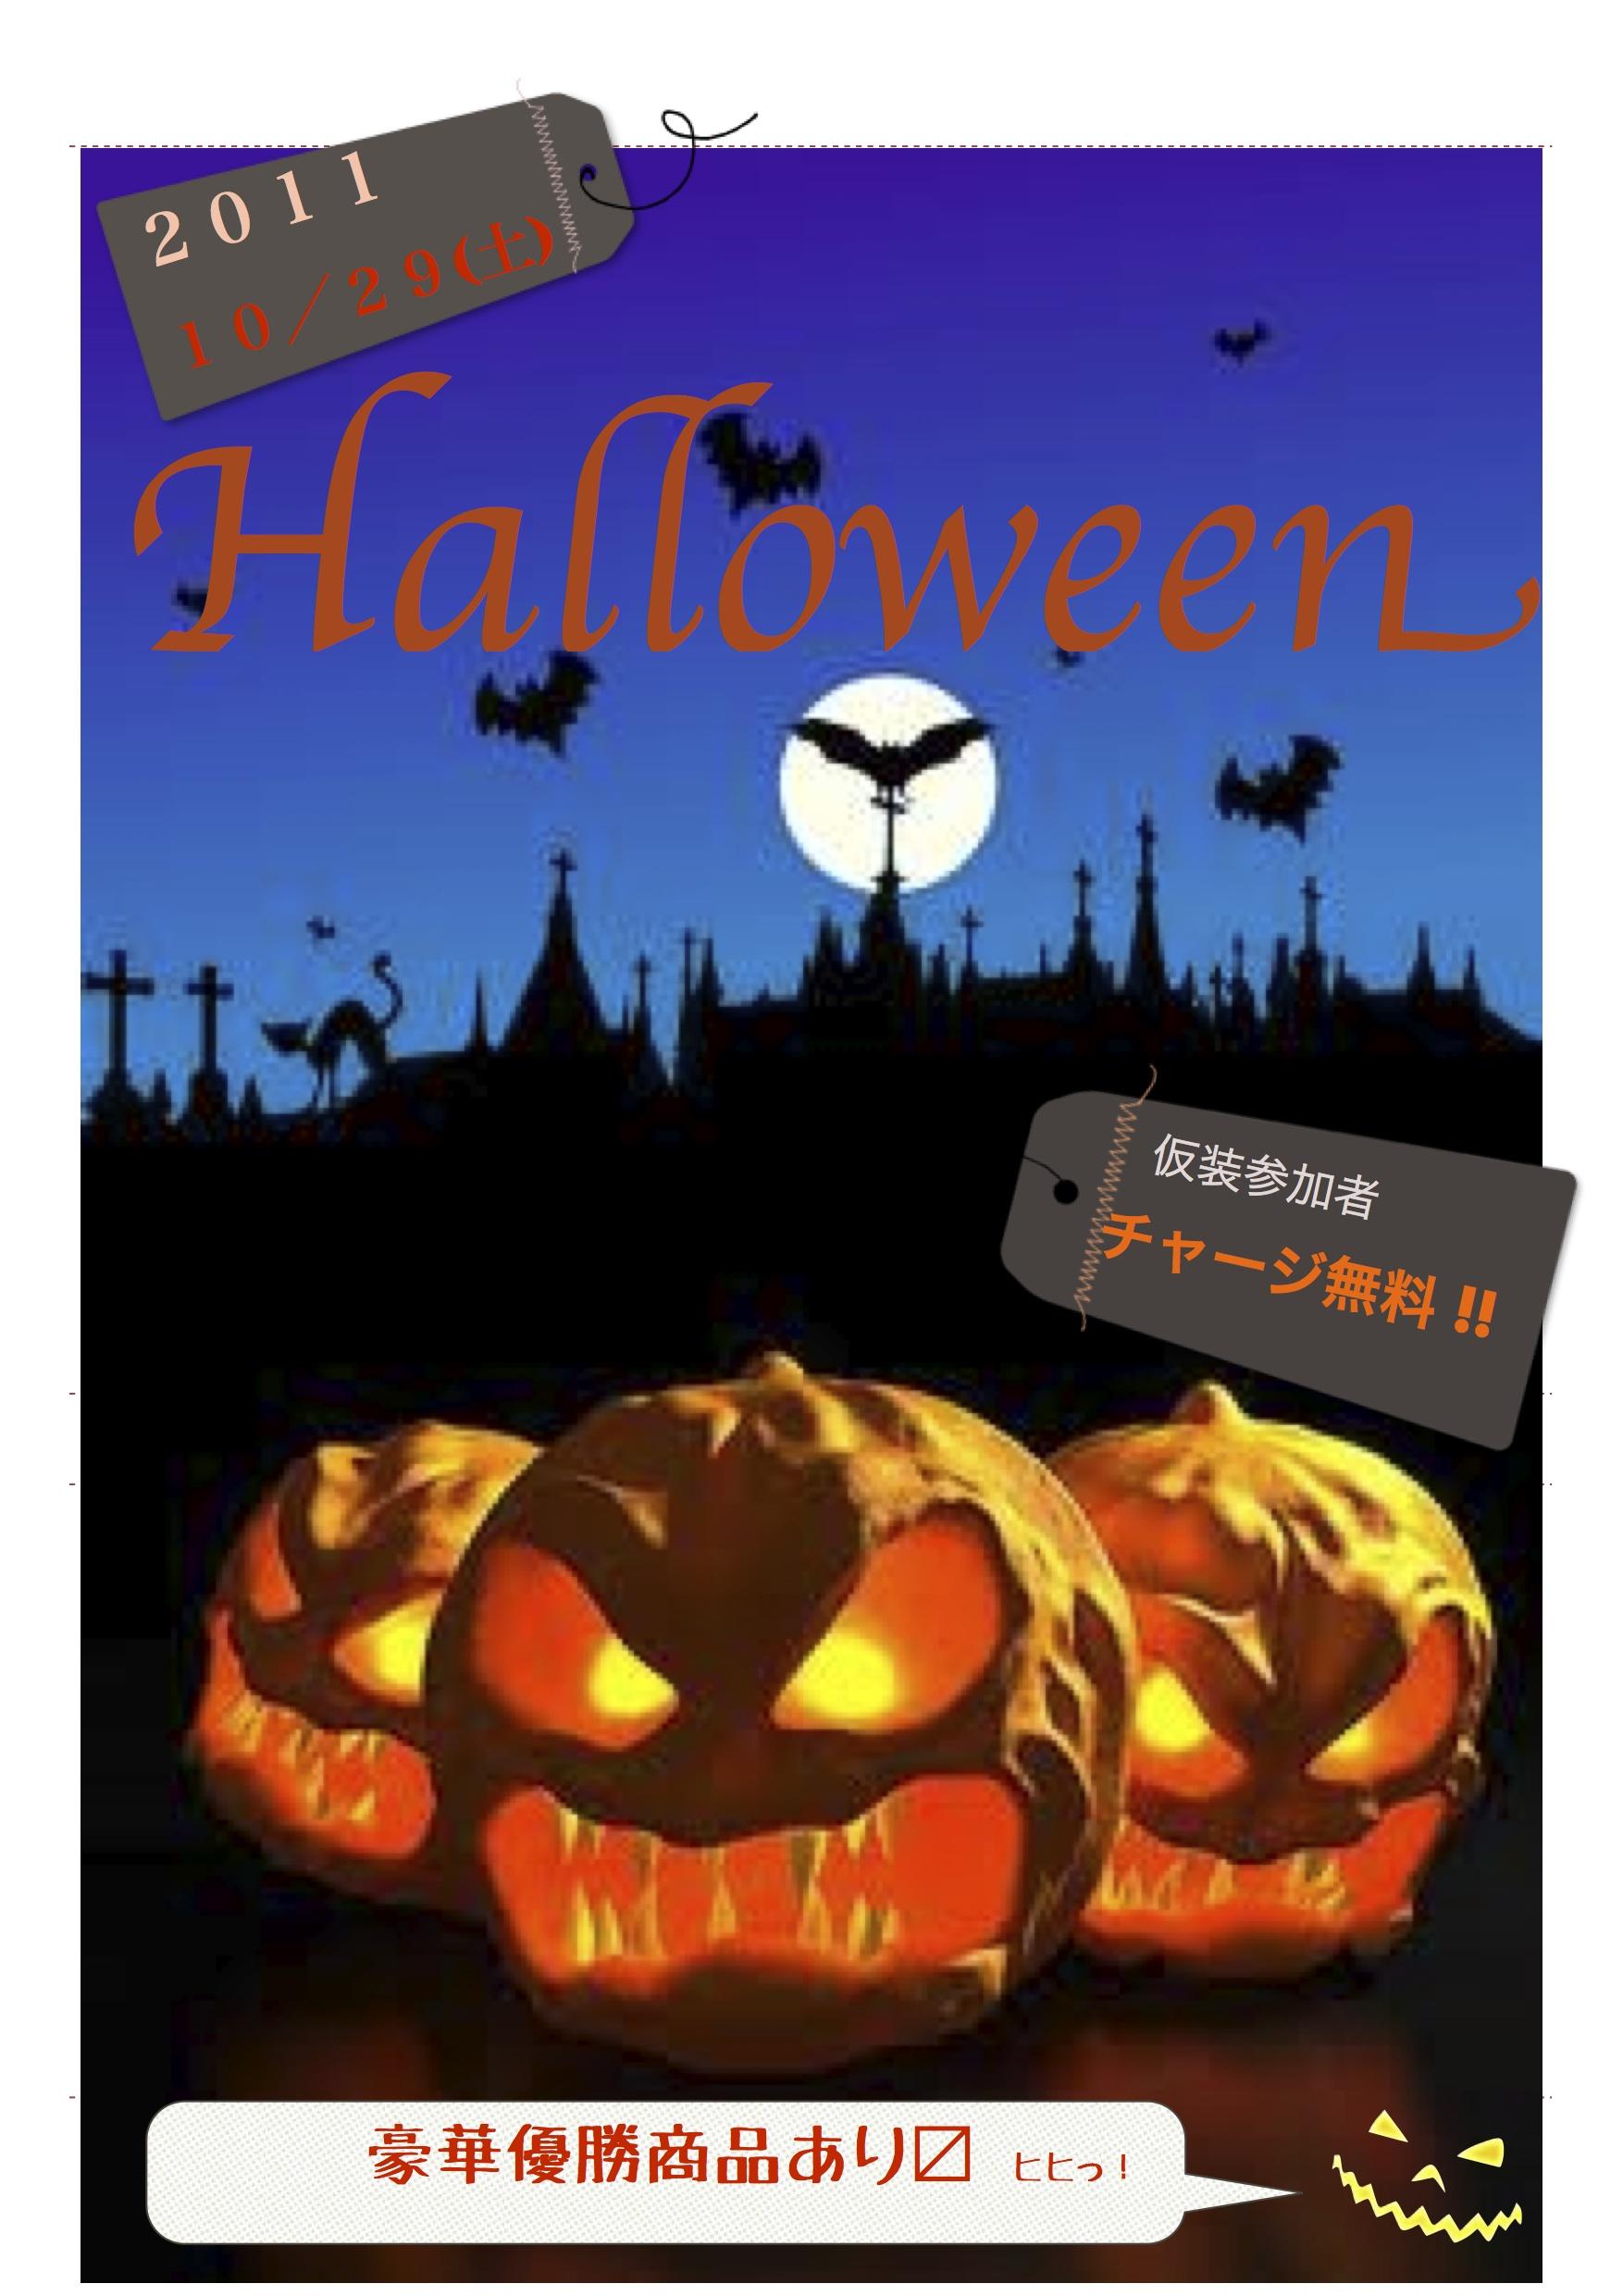 halloween2011-e5ae8ce68890